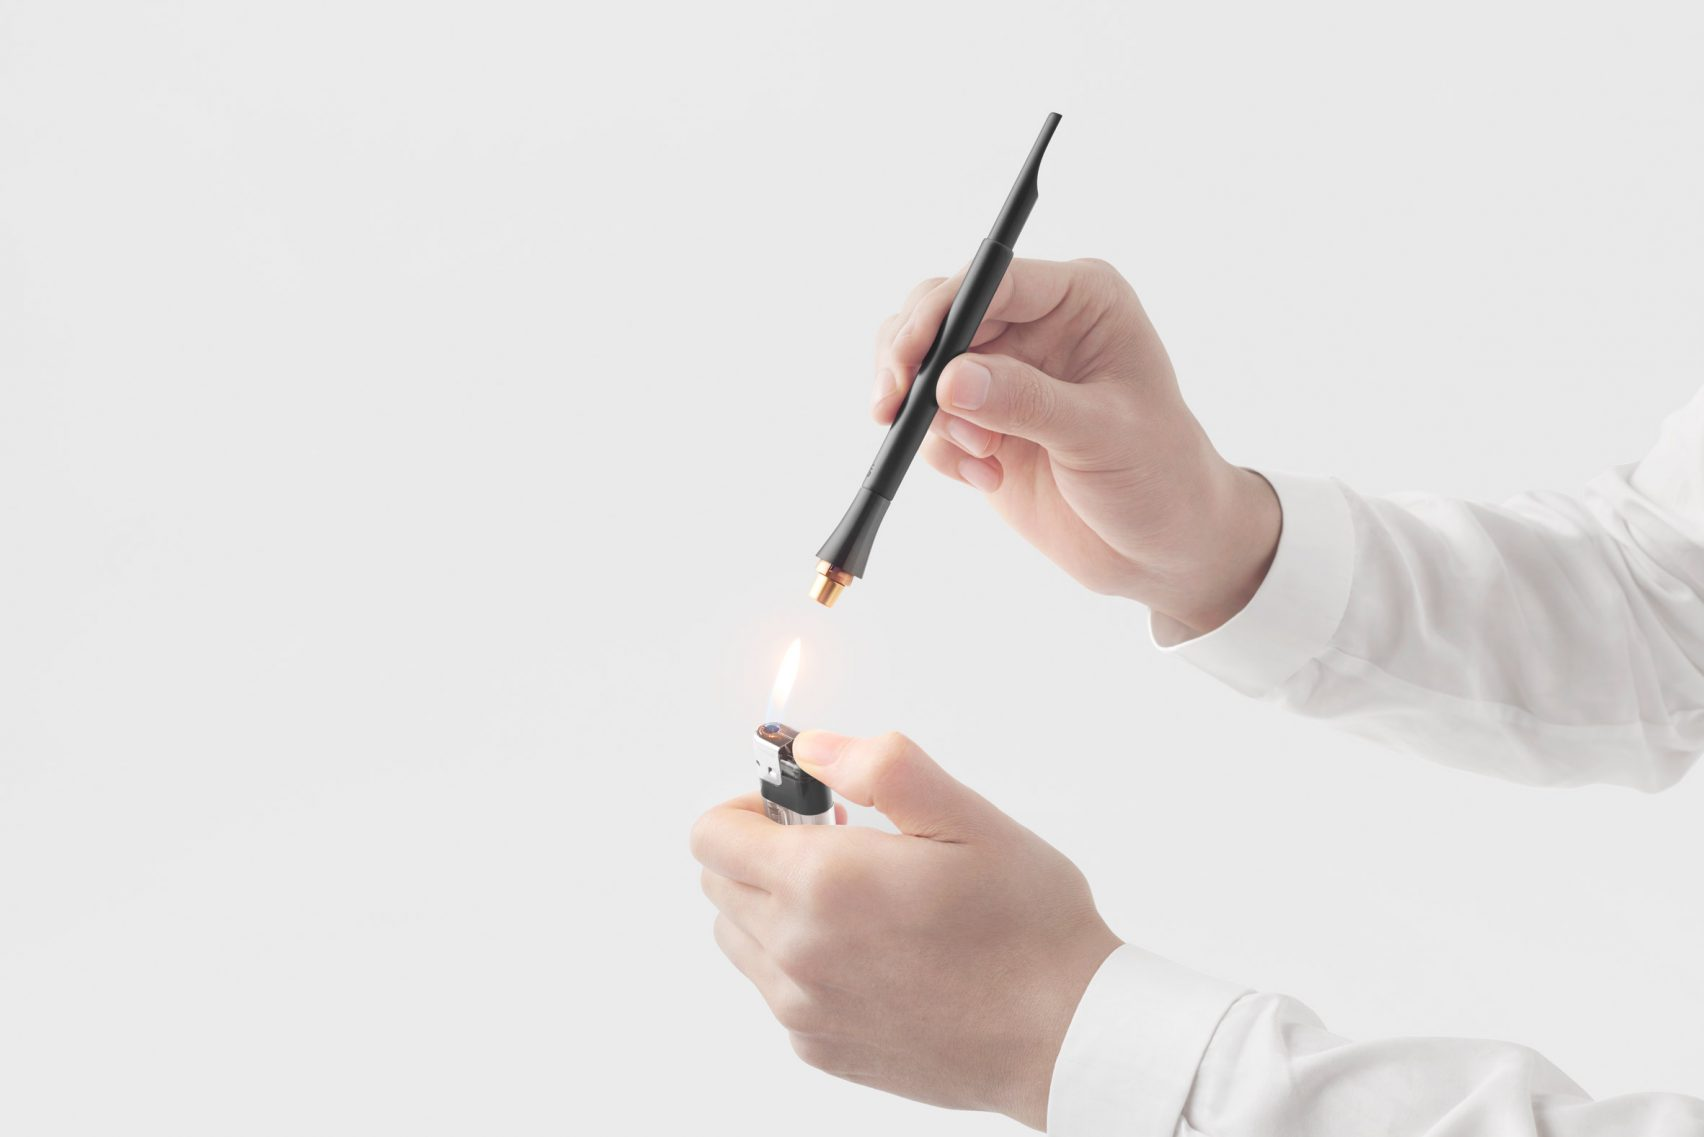 nendo-electronic-cigarette-product-capsules-noko-04.jpg